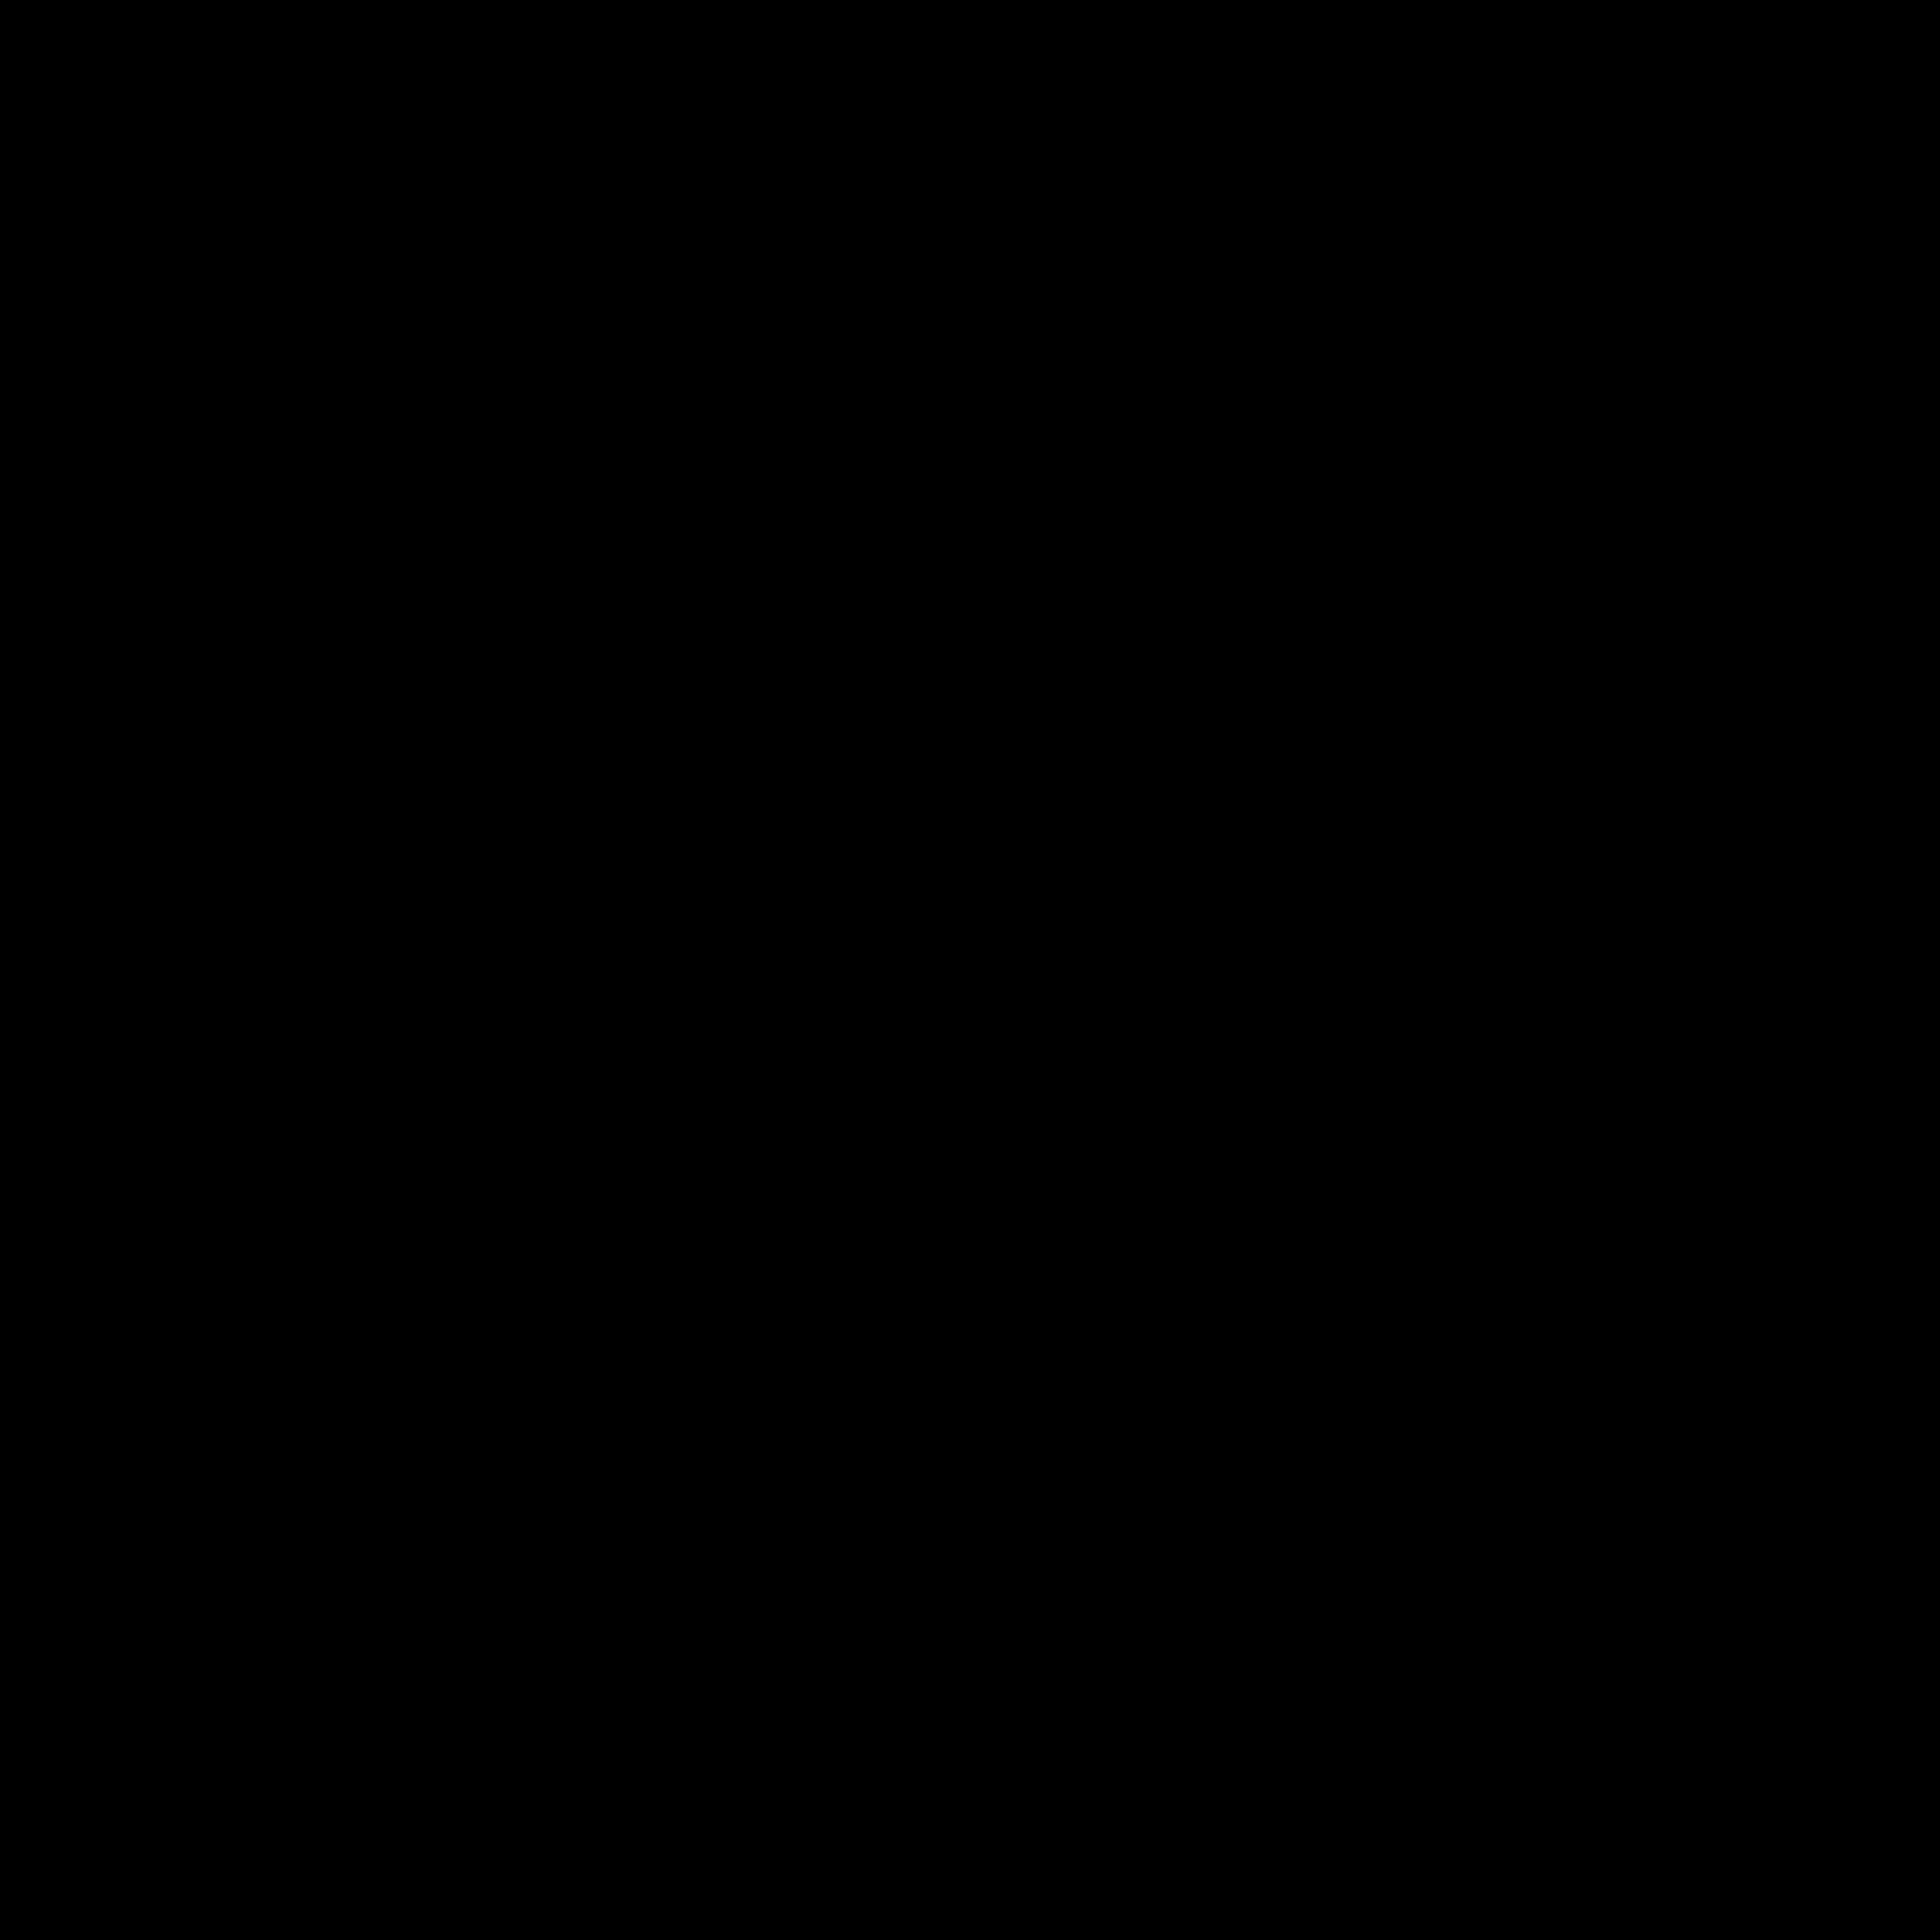 Mother Records Logo PNG Transparent & SVG Vector.